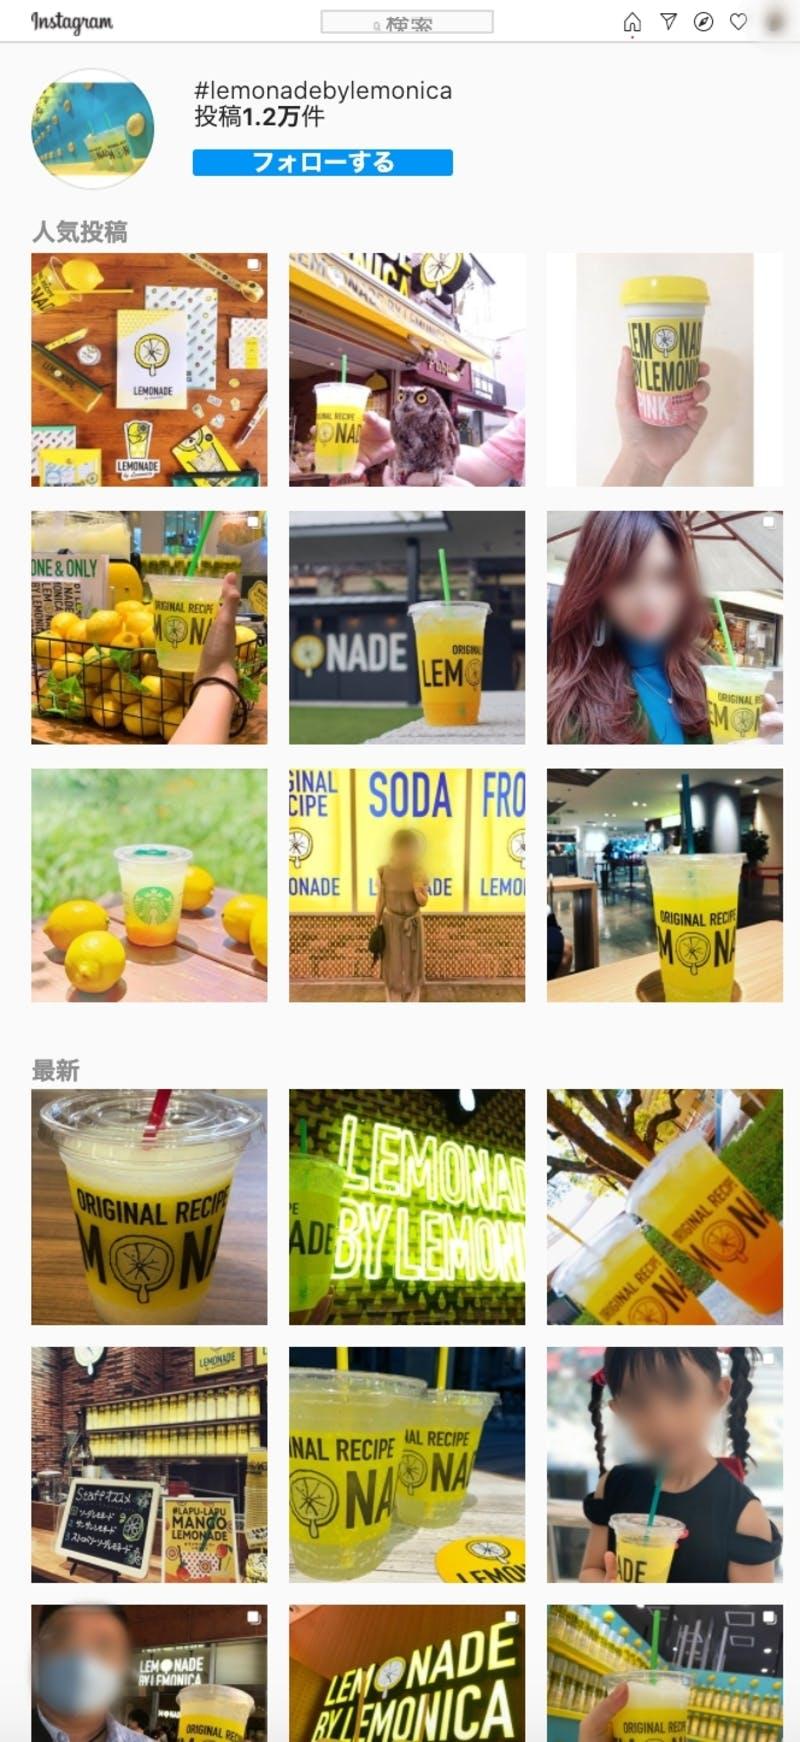 #lemonadebylemonica ハッシュタグ検索